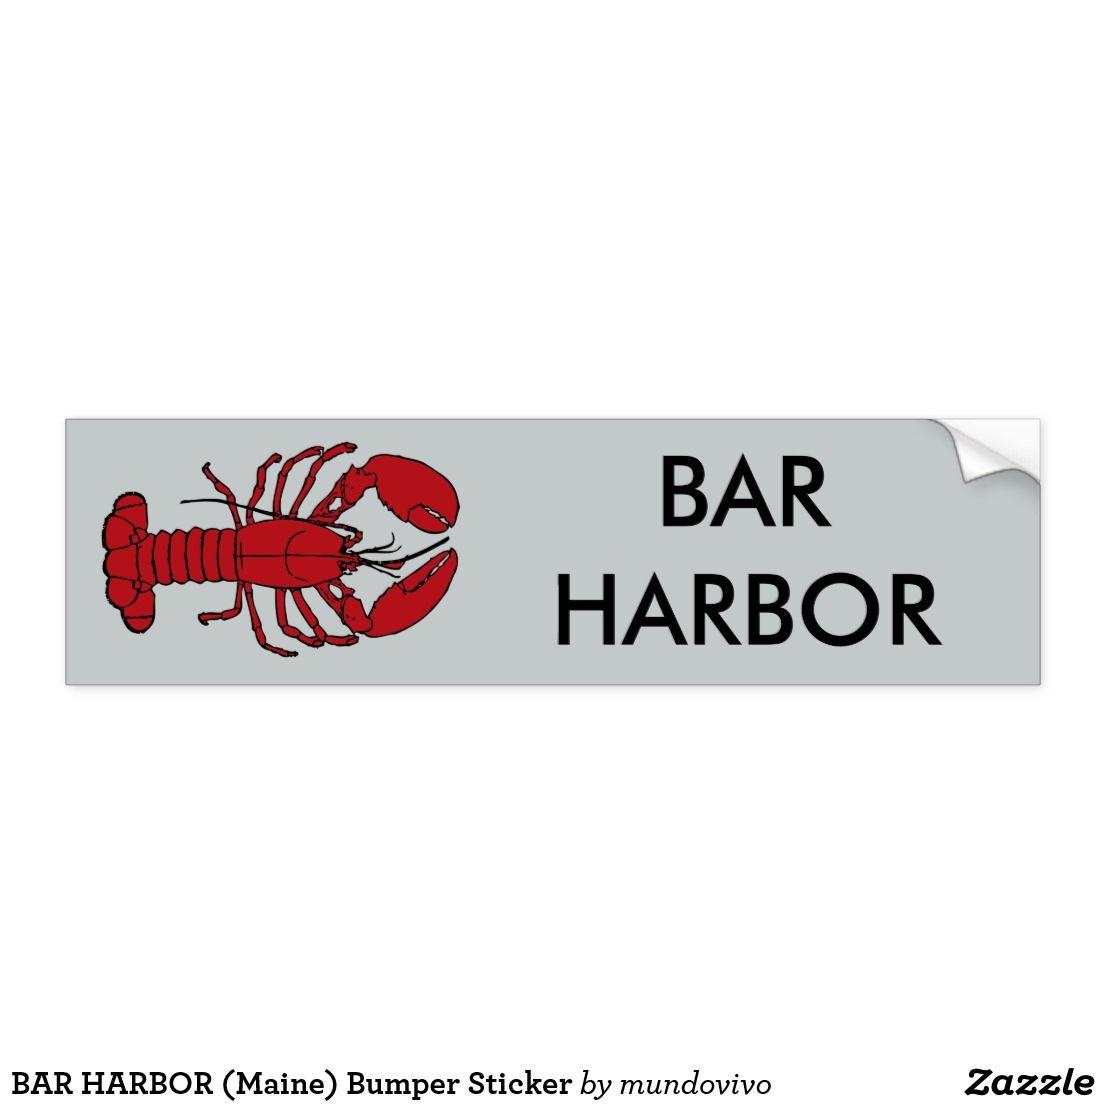 Bar Harbor Maine Bumper Sticker Zazzle Com Bar Harbor Maine Bumper Stickers Bar Harbor [ 1106 x 1106 Pixel ]